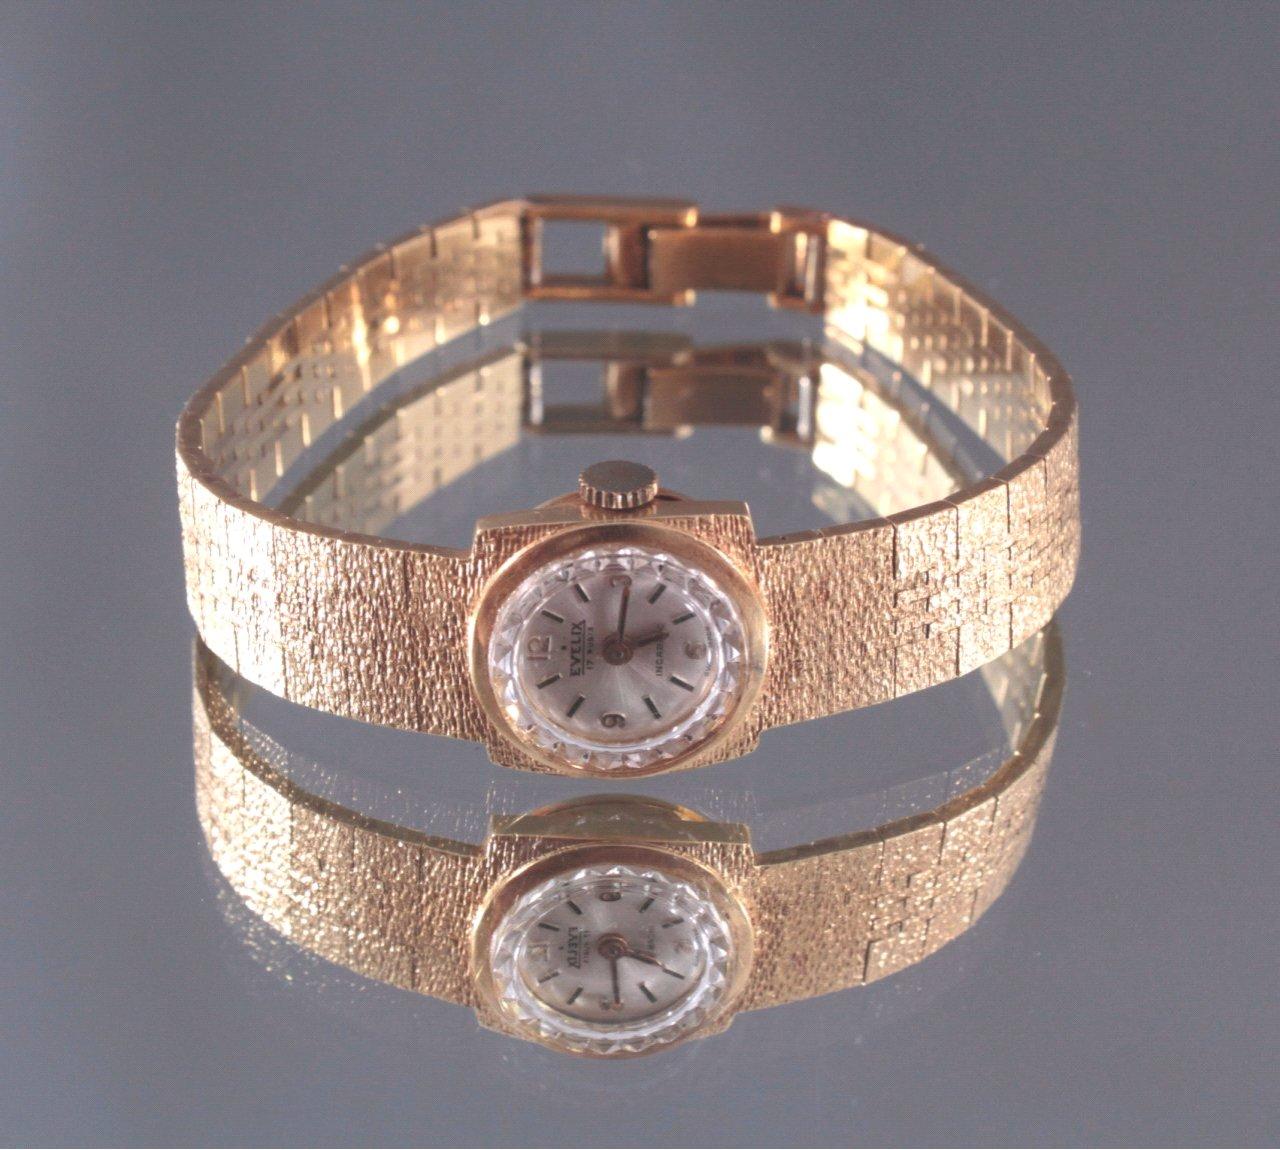 Damenarmbanduhr Evelix, 750/000 Gelb Gold-1